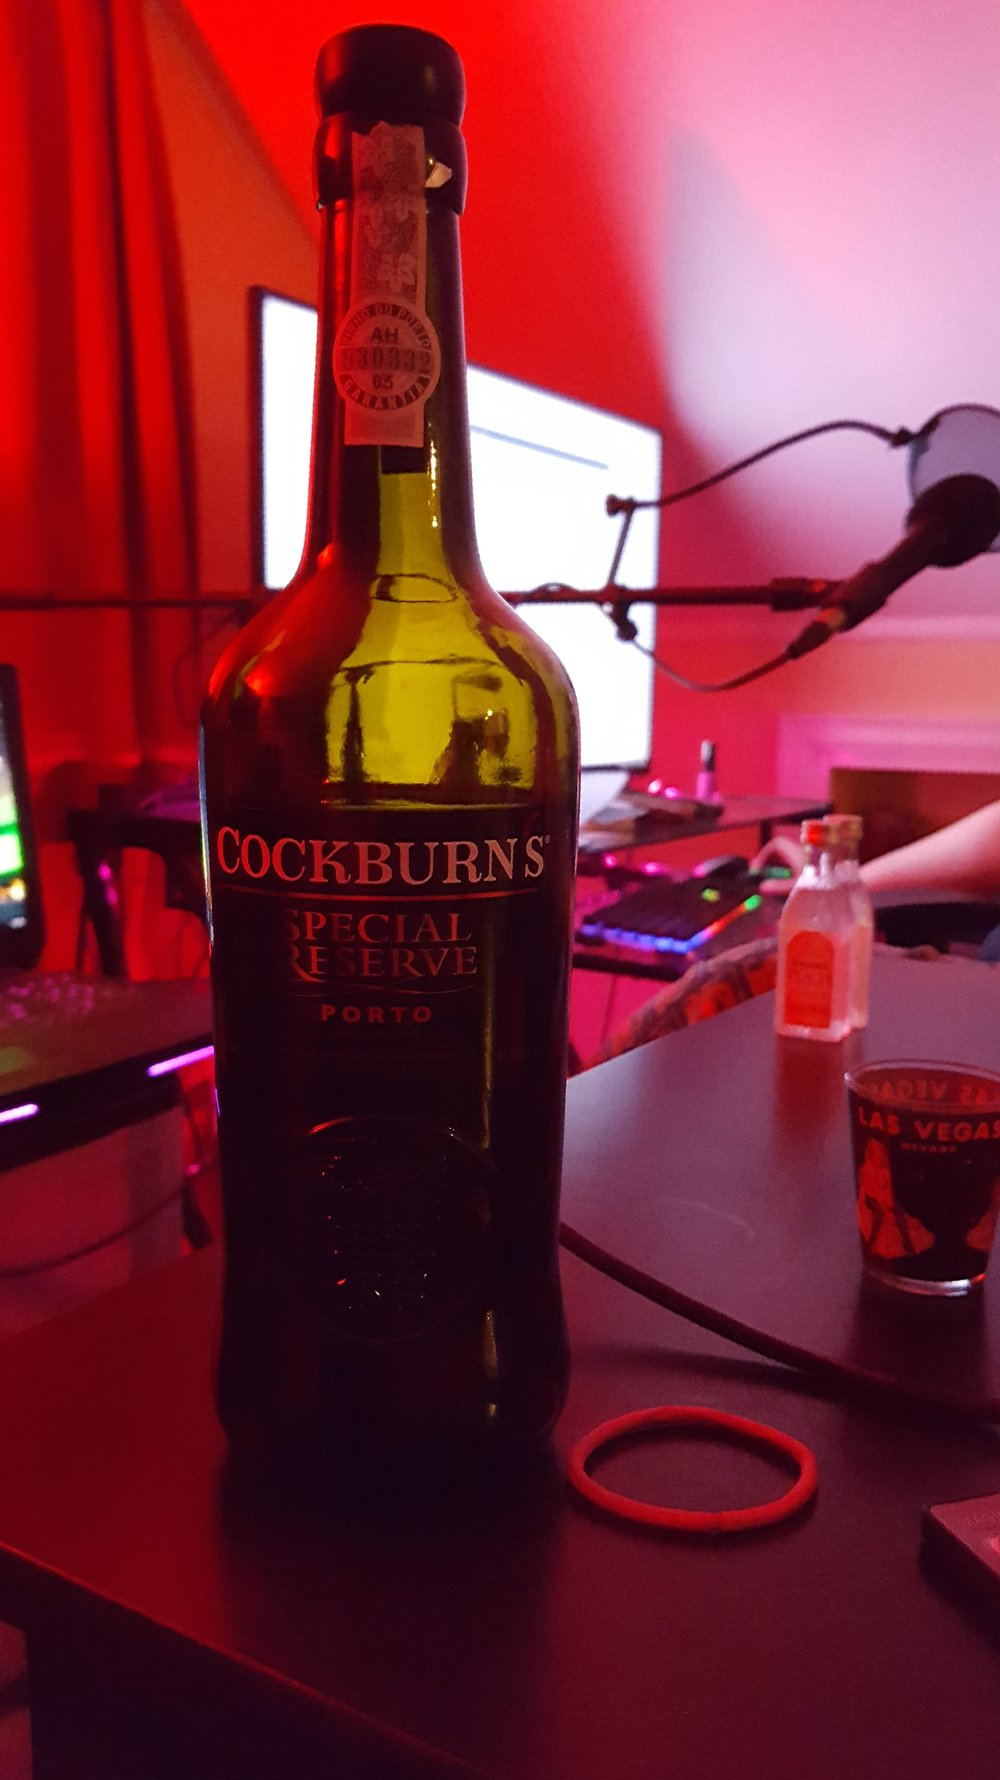 Mmmm...Cockburn -